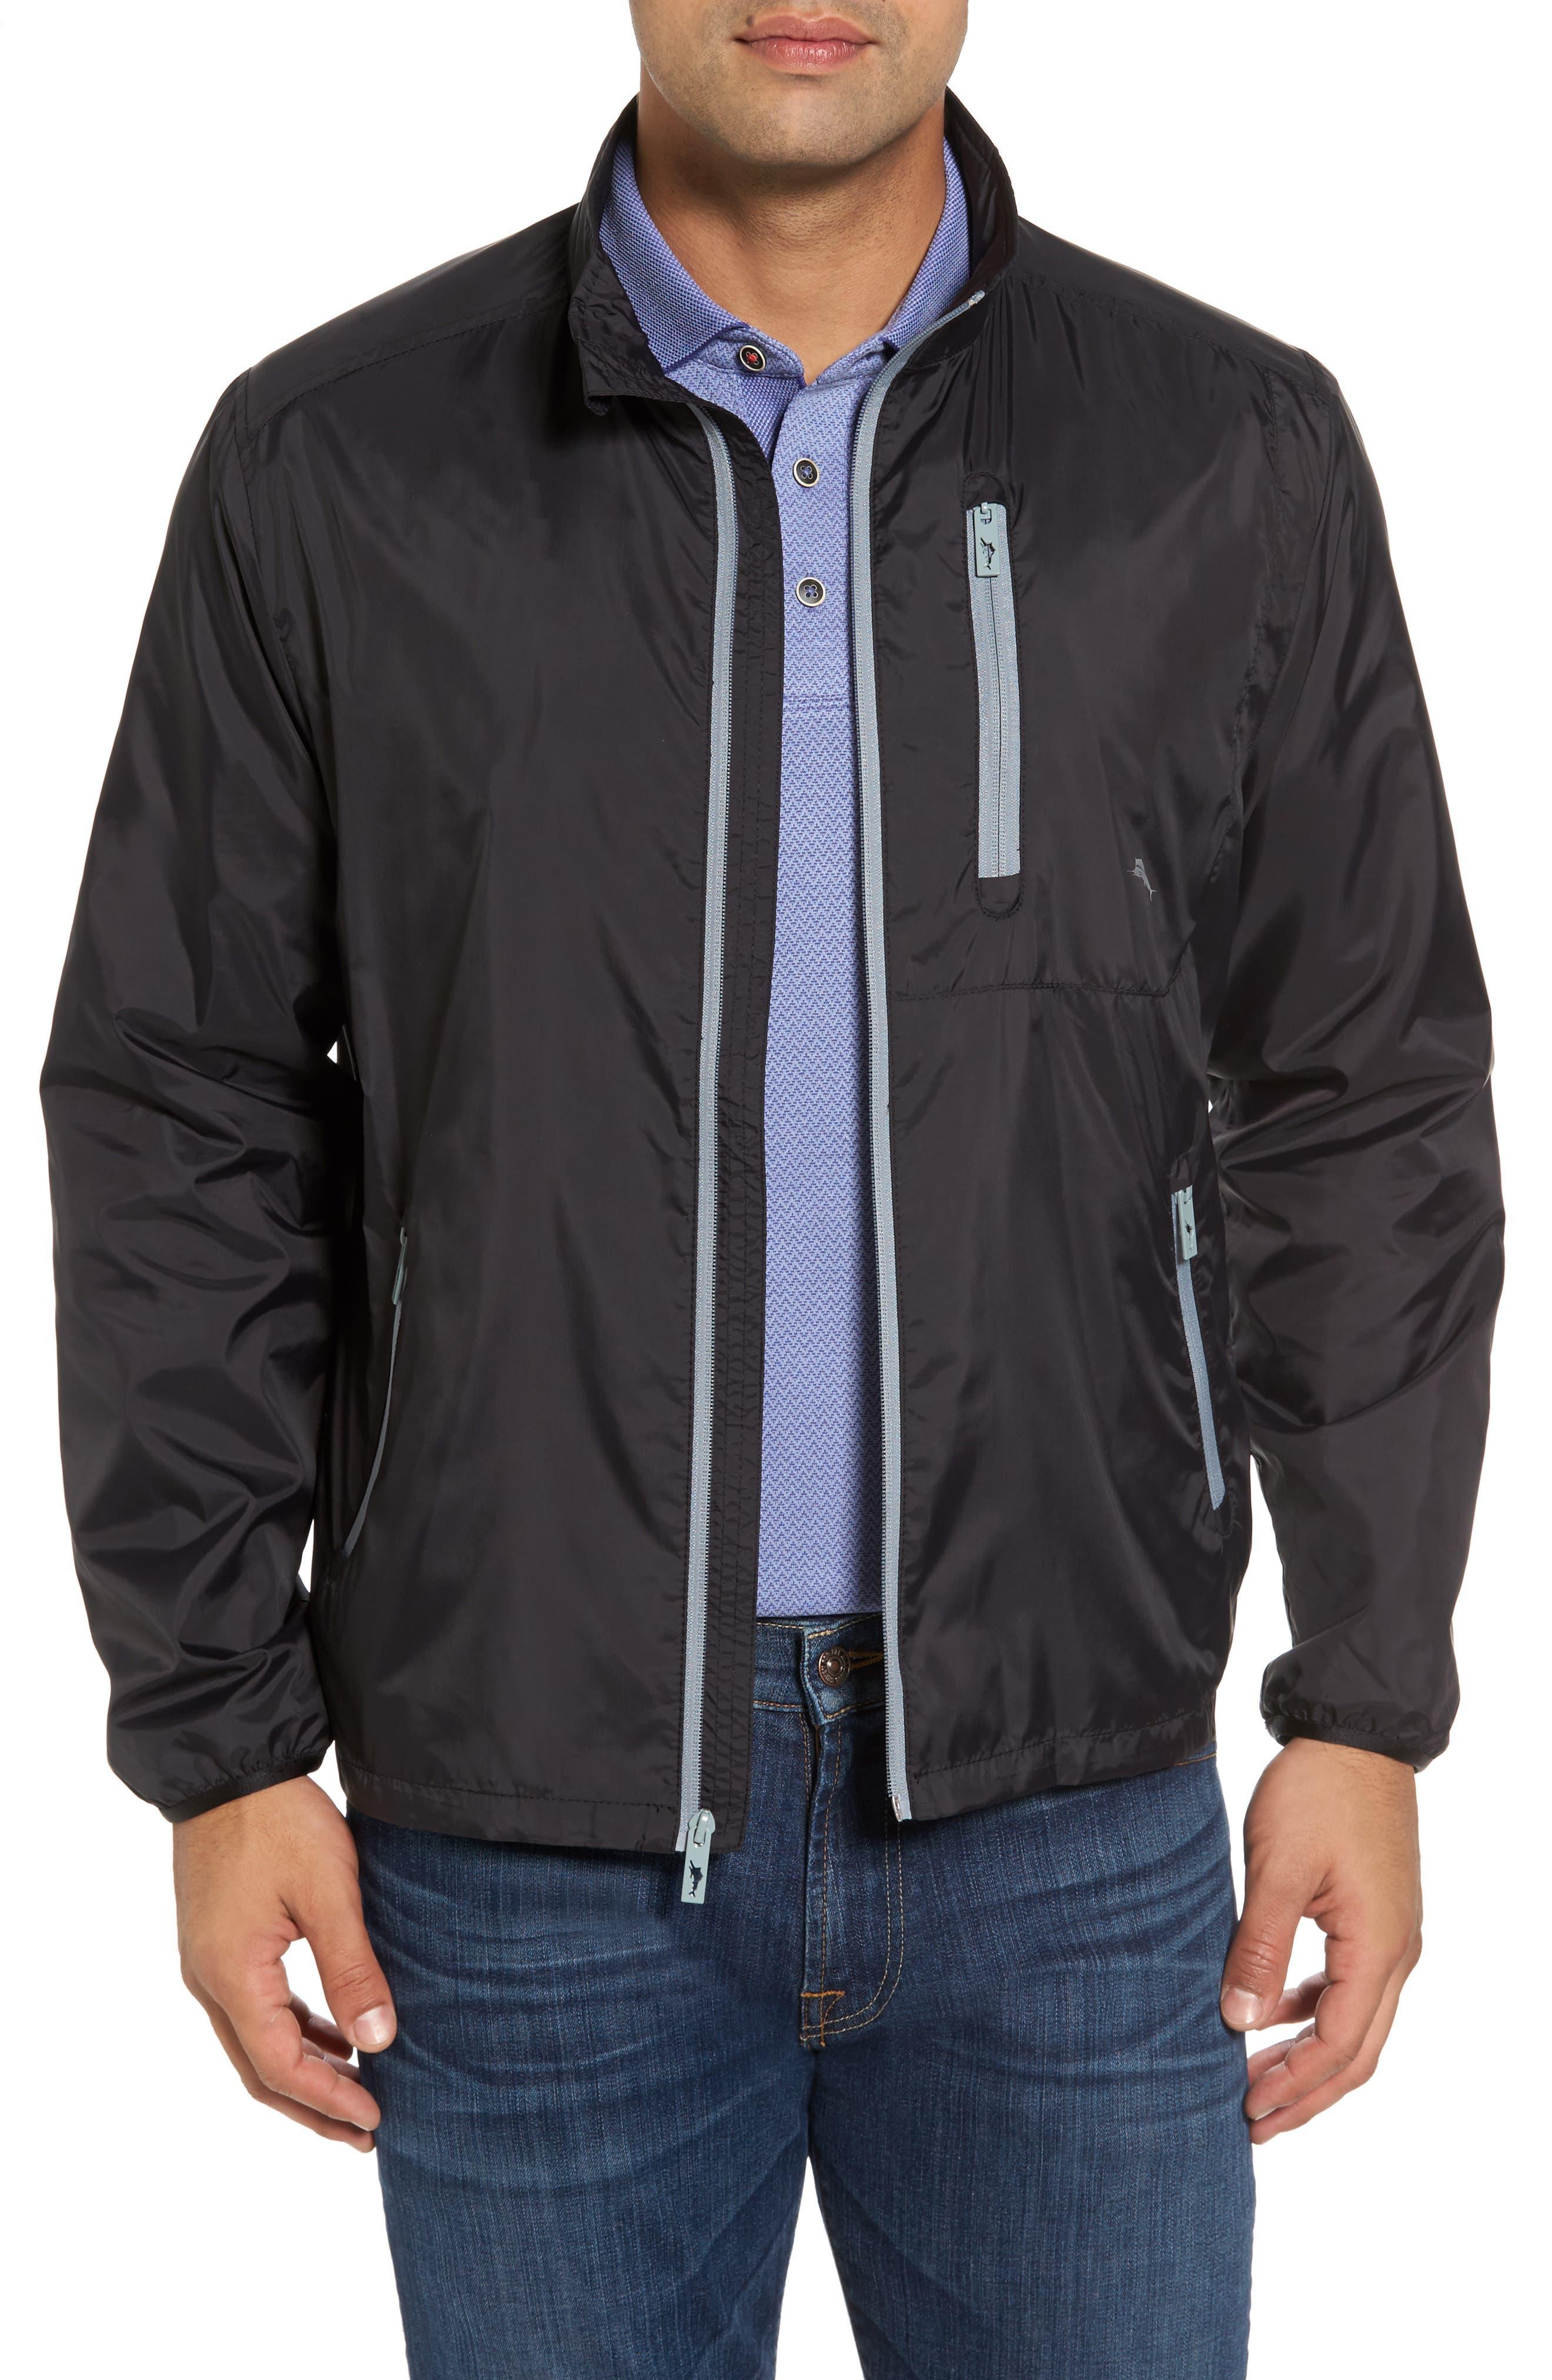 Nine Iron Water-Repellent Jacket,                             Main thumbnail 1, color,                             Black